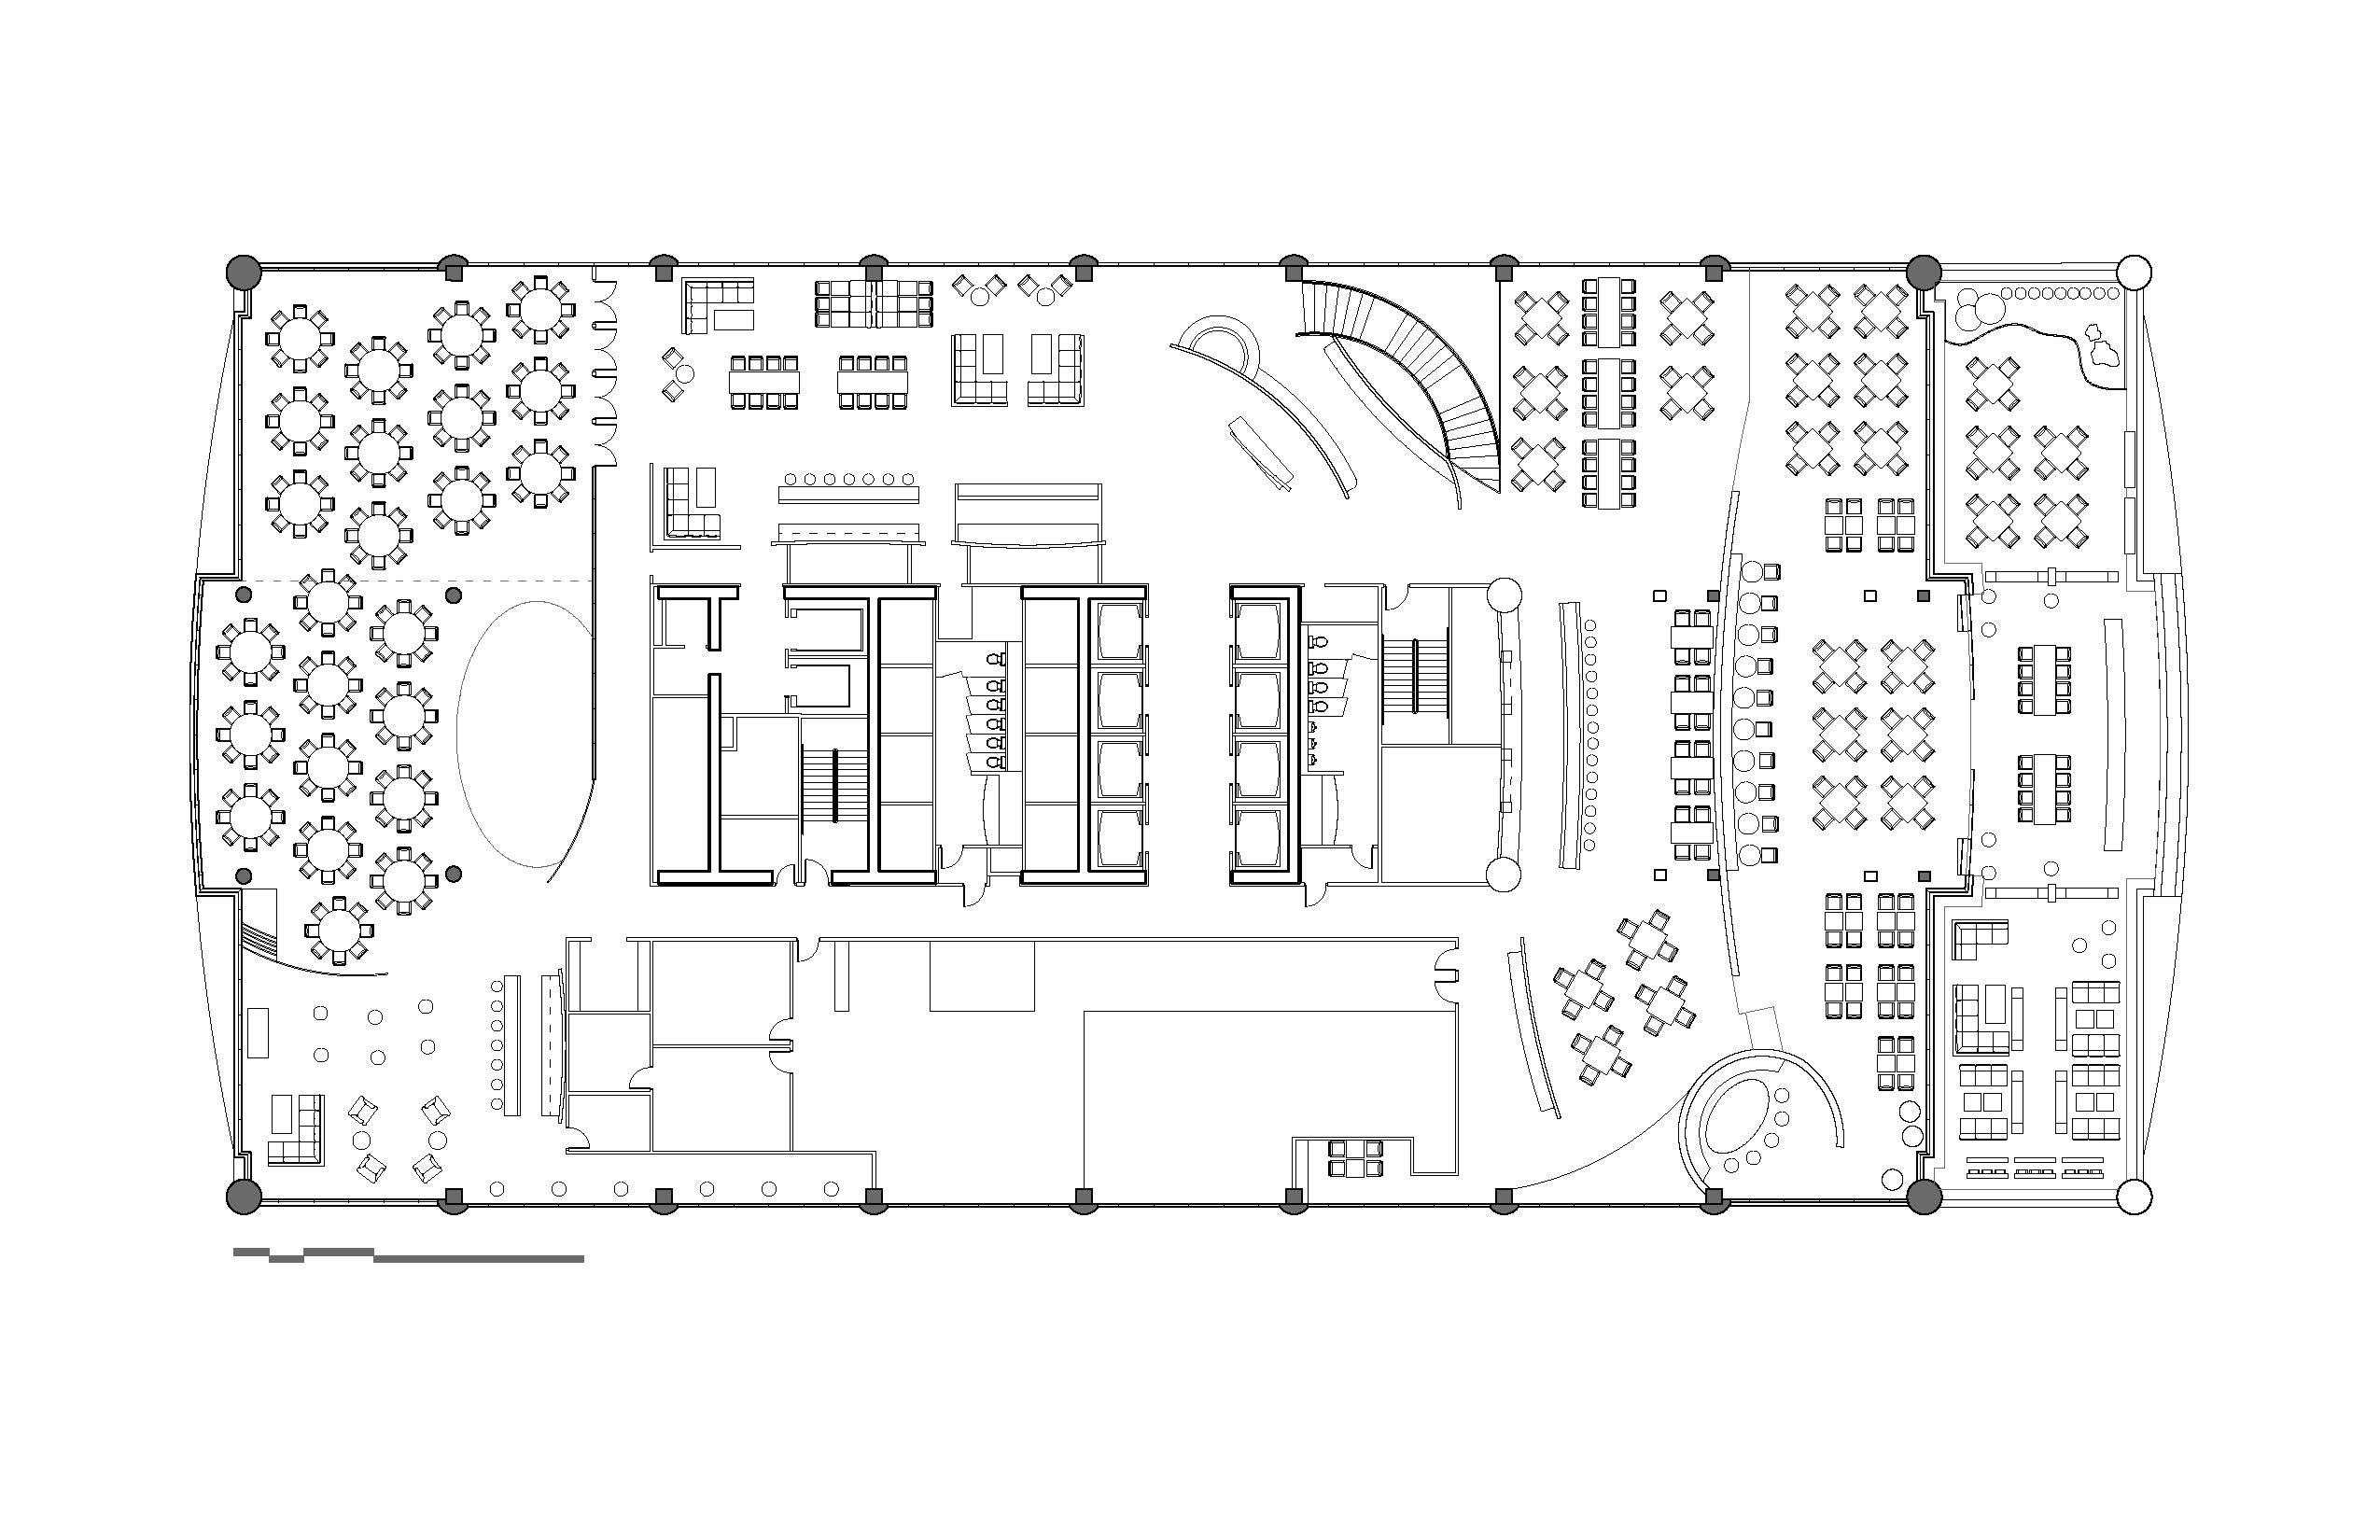 Hotel lobby floor plan - Hotel Floor Plan Seating Arrangement